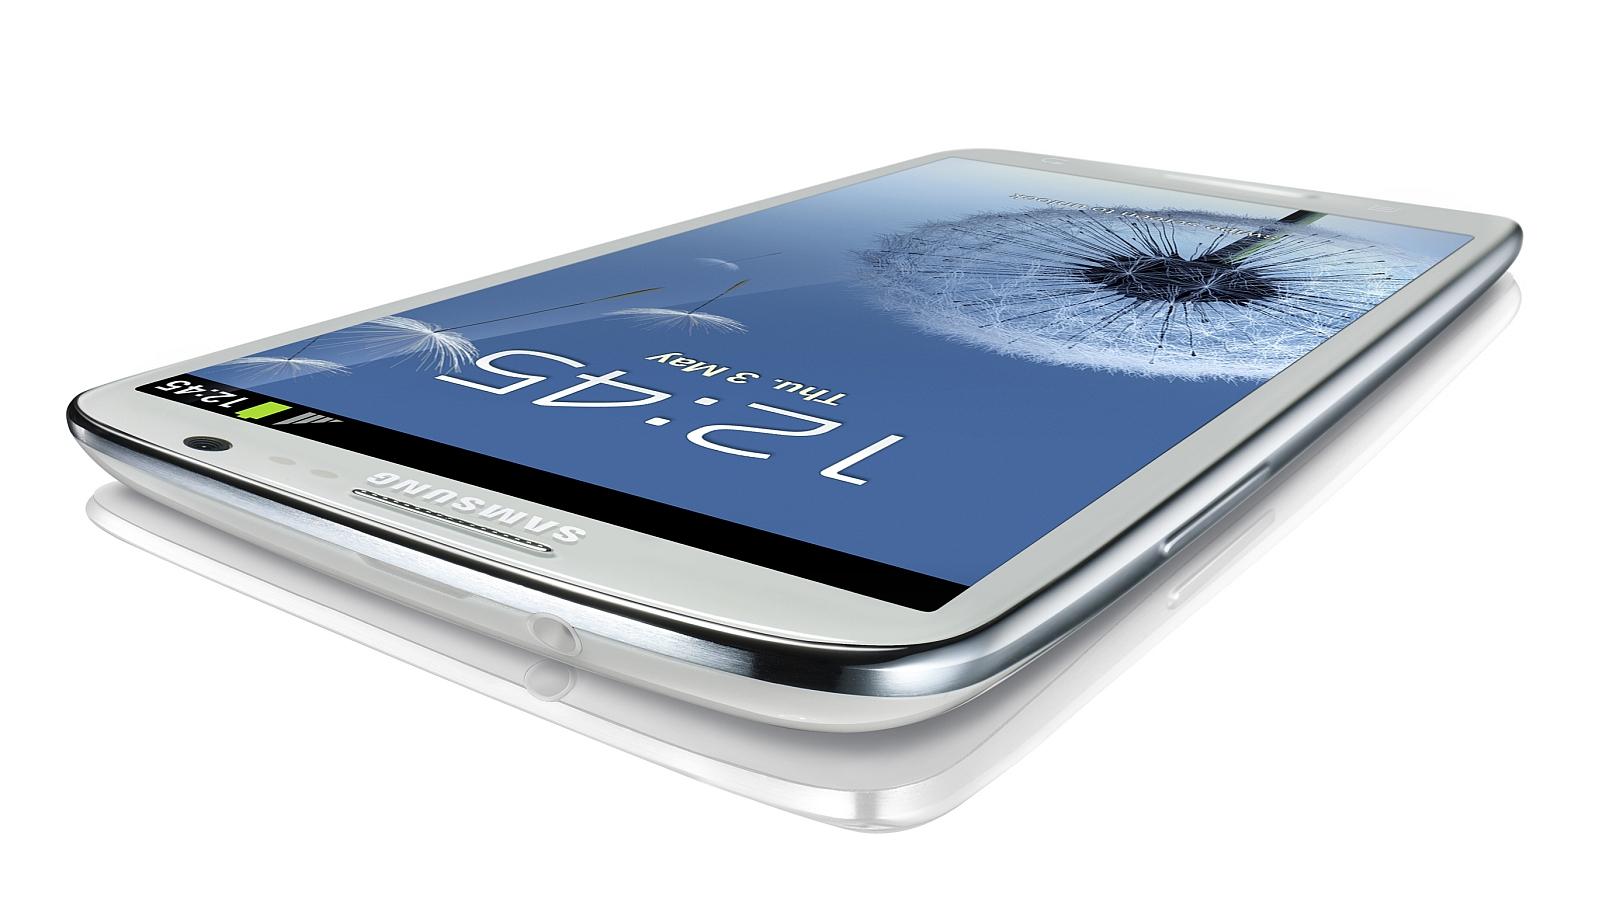 Samsung Galaxy S3 – De 100 de ori mai performant decat primul meu PC [REVIEW]